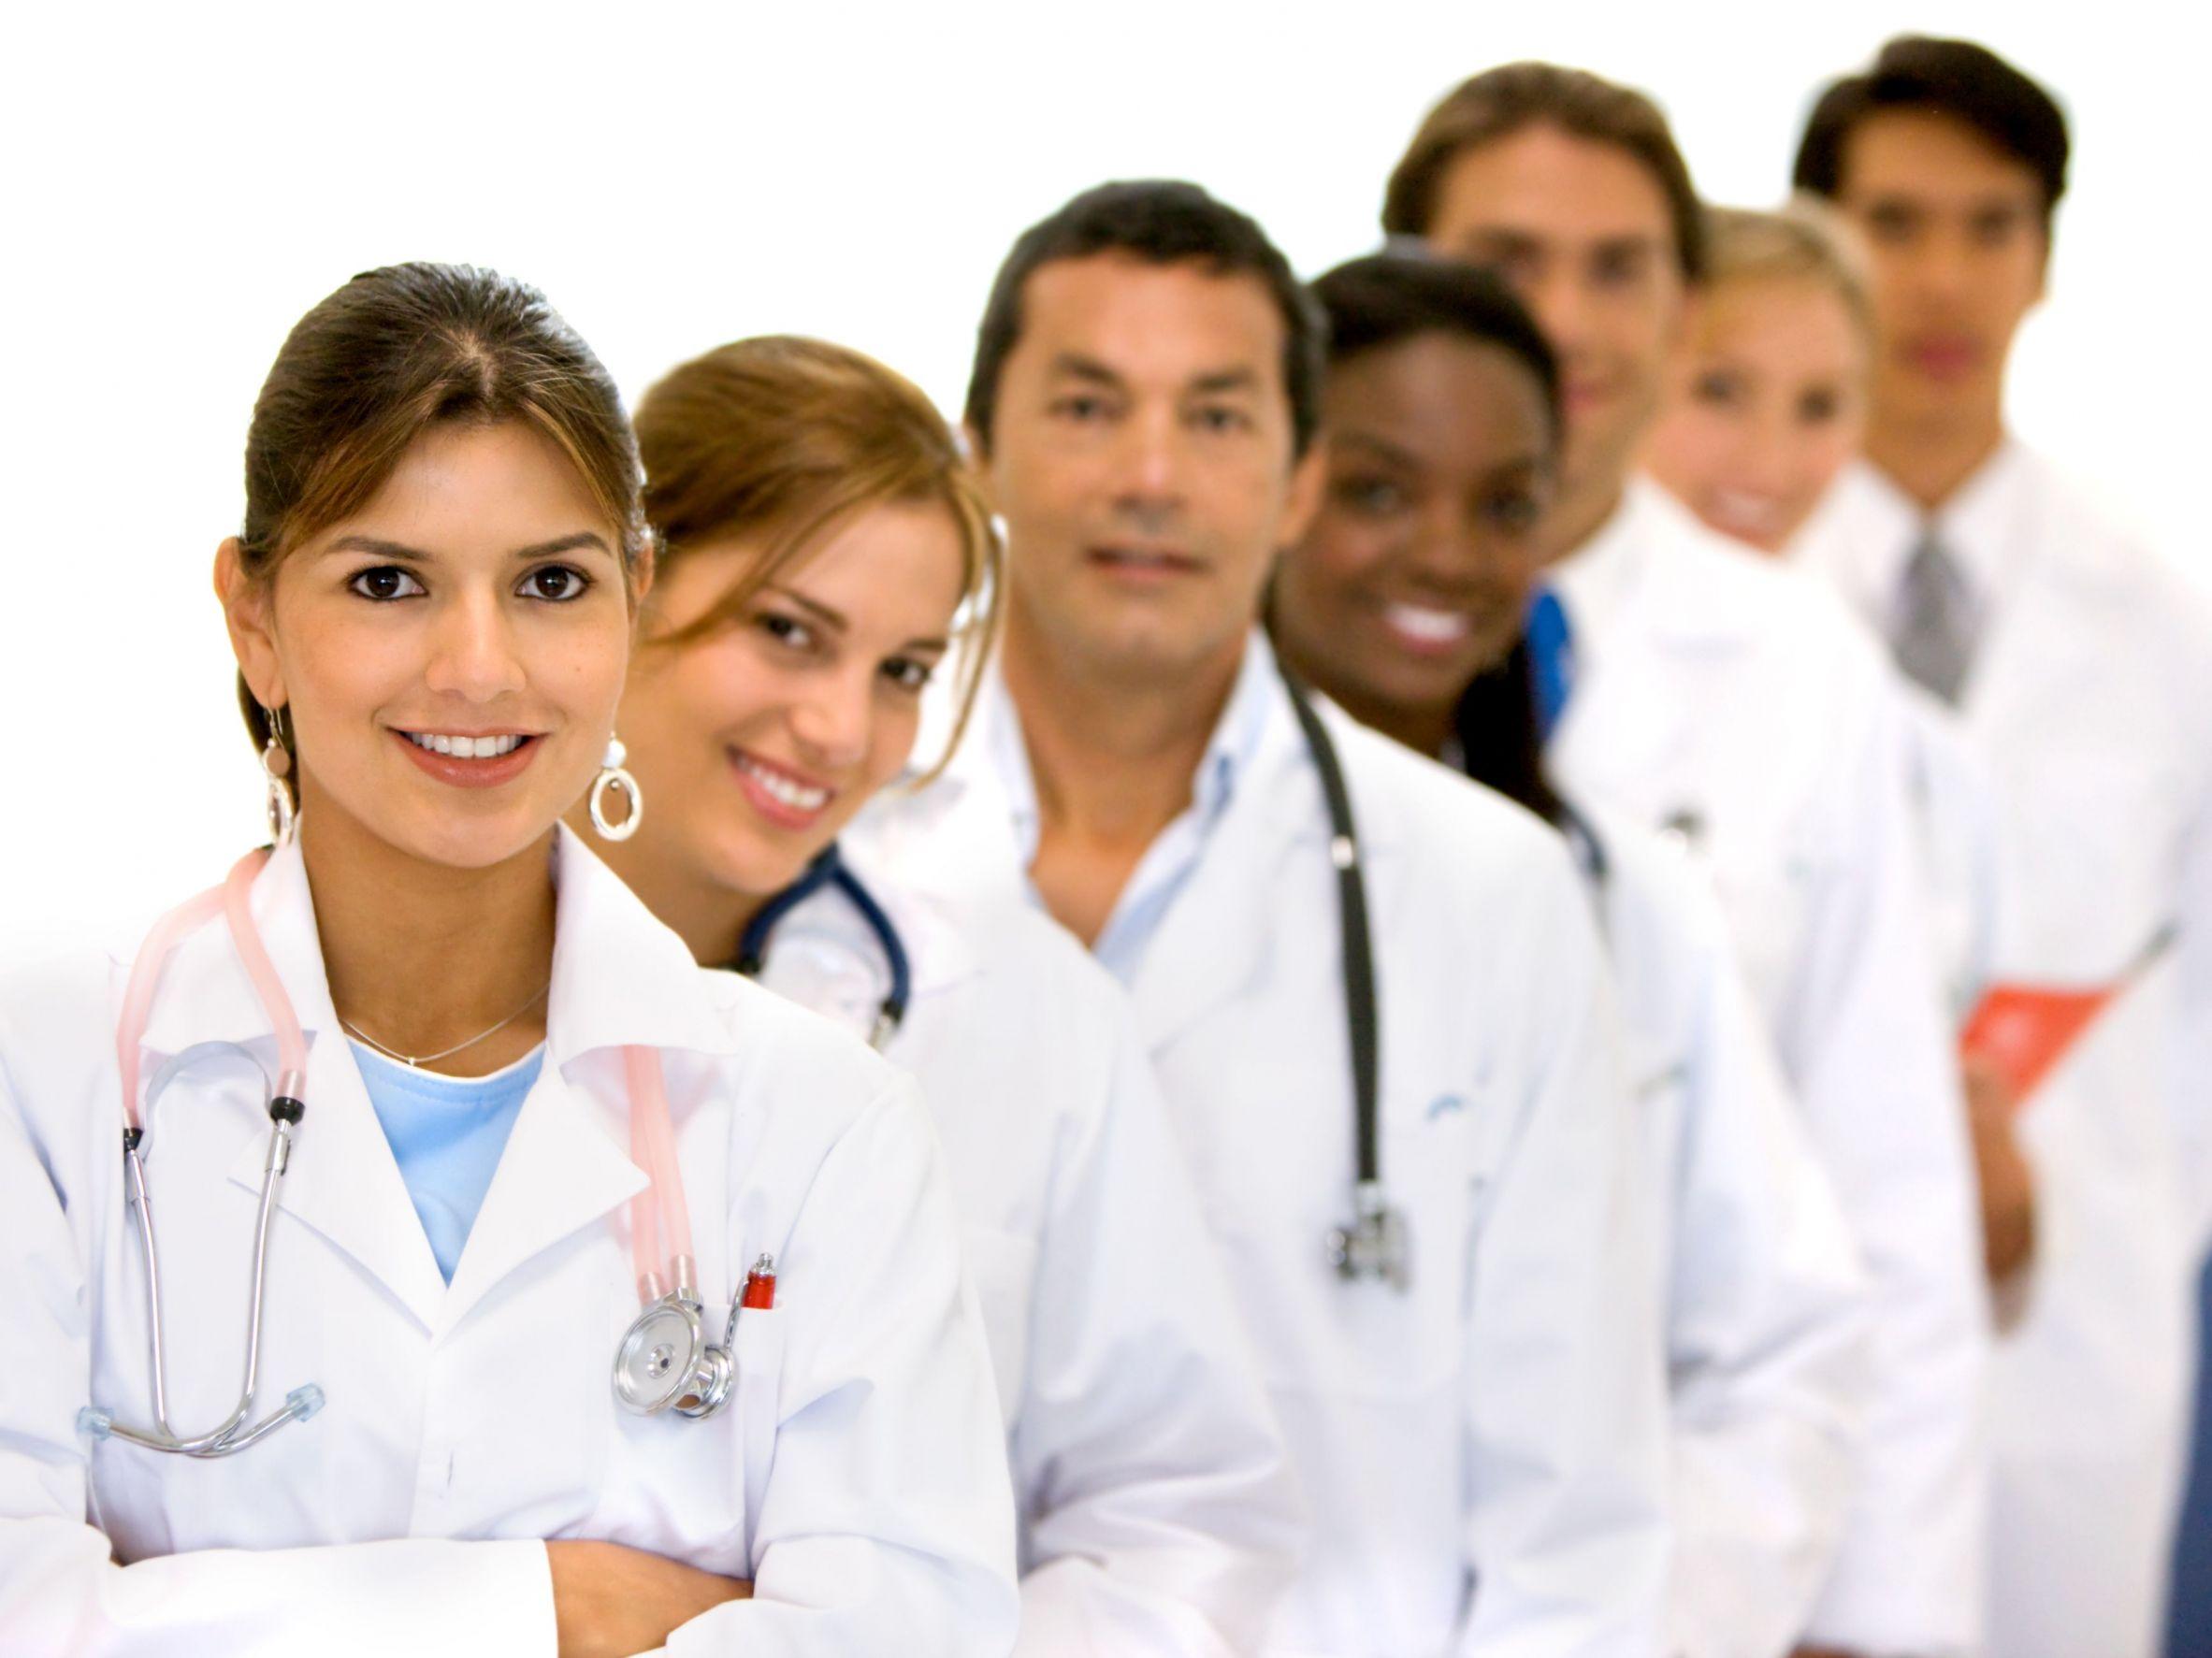 Curso Gratis de Auxiliar de Enfermeria